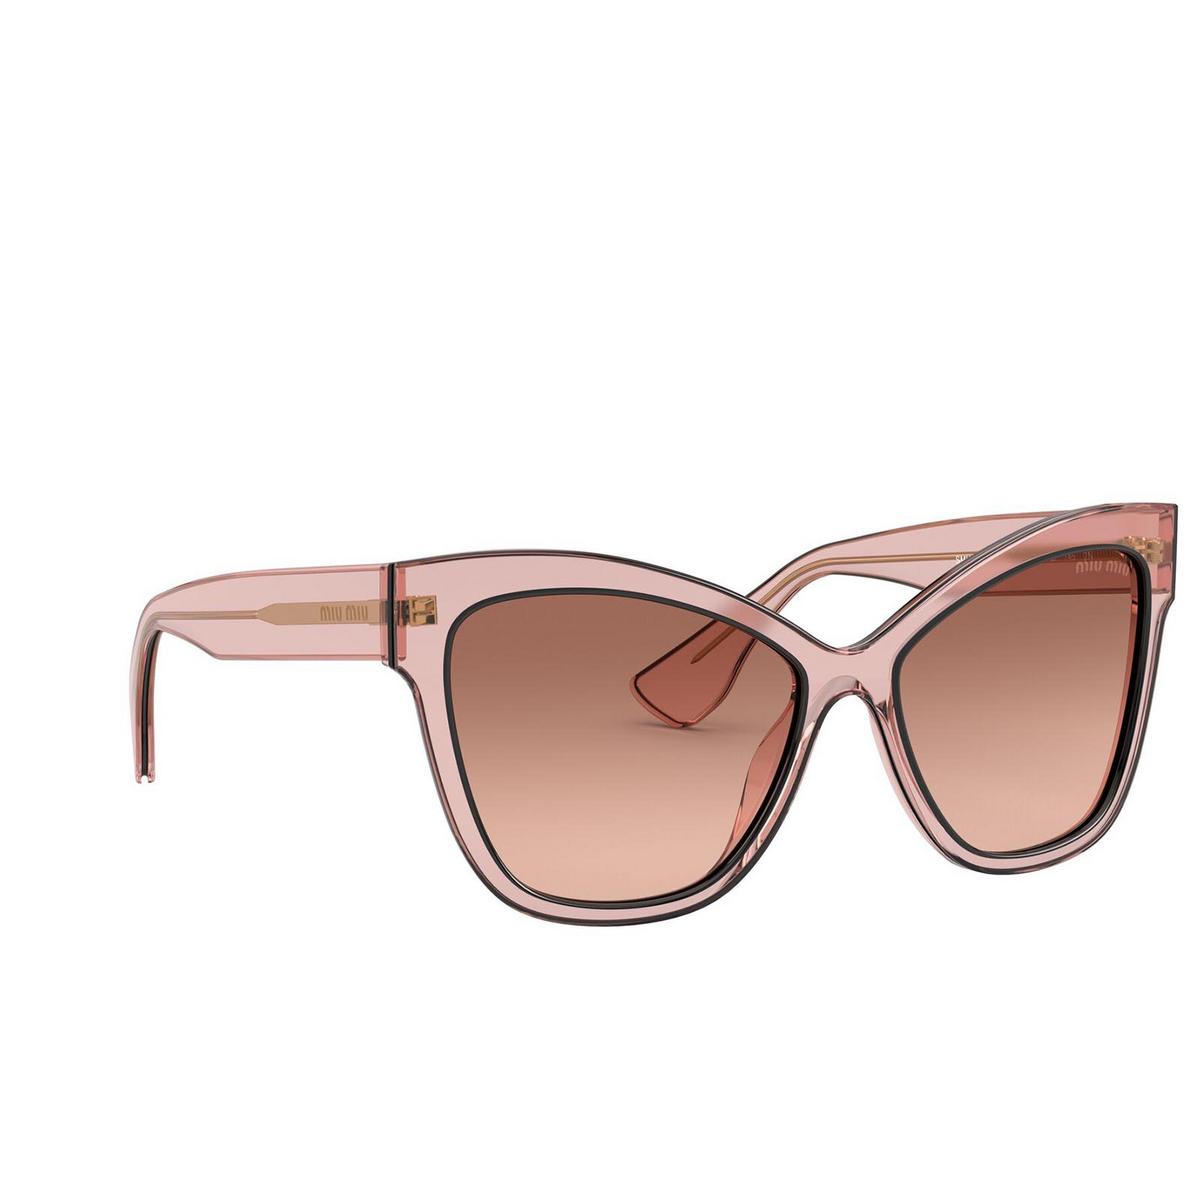 Miu Miu® Cat-eye Sunglasses: MU 08VS color Pink Transparent 01I0A5.